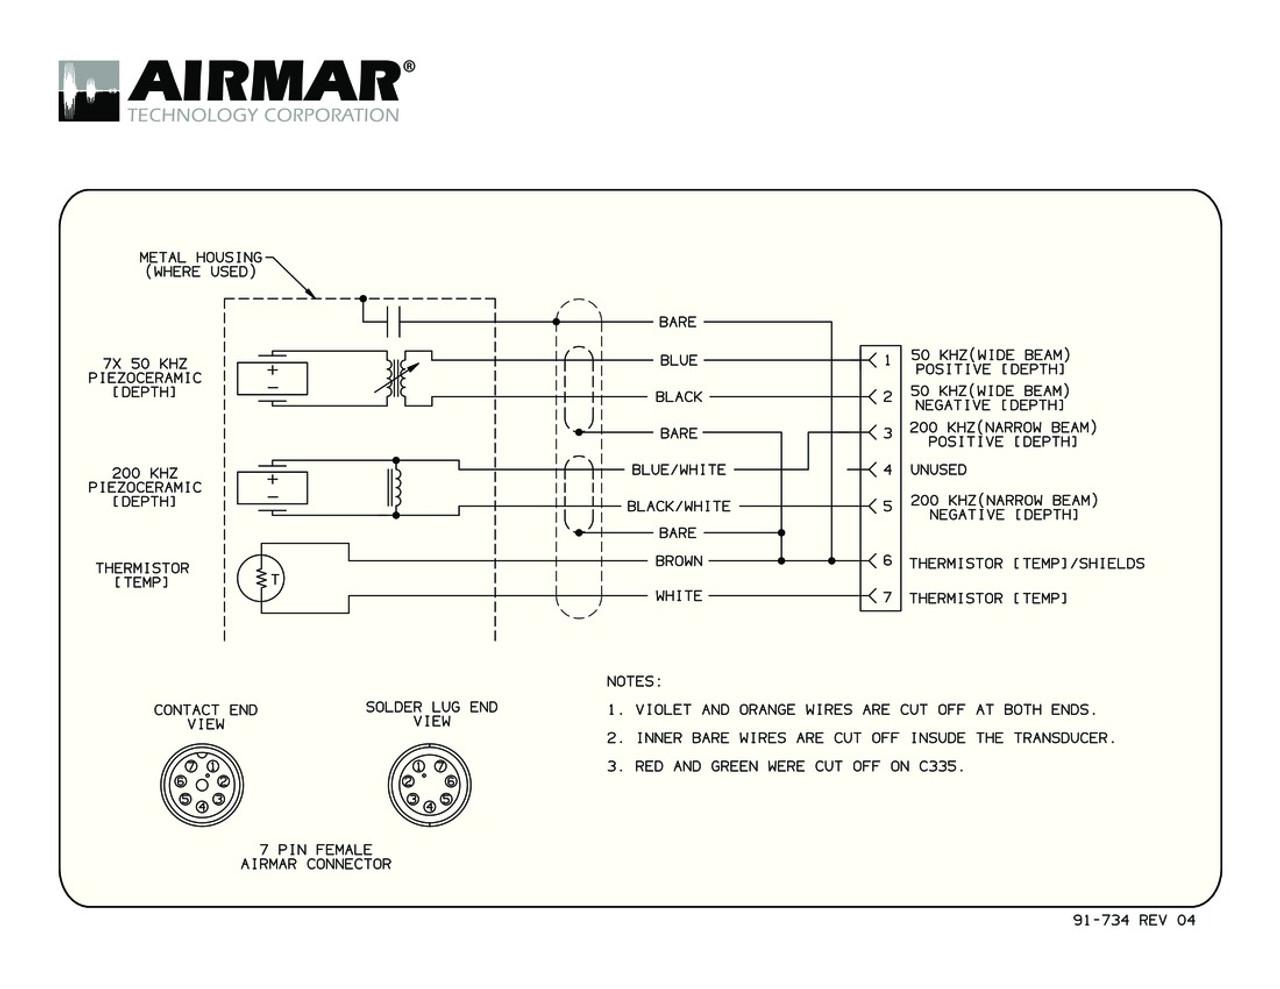 Airmar Wiring Diagram Simrad 1kw 7 Pin